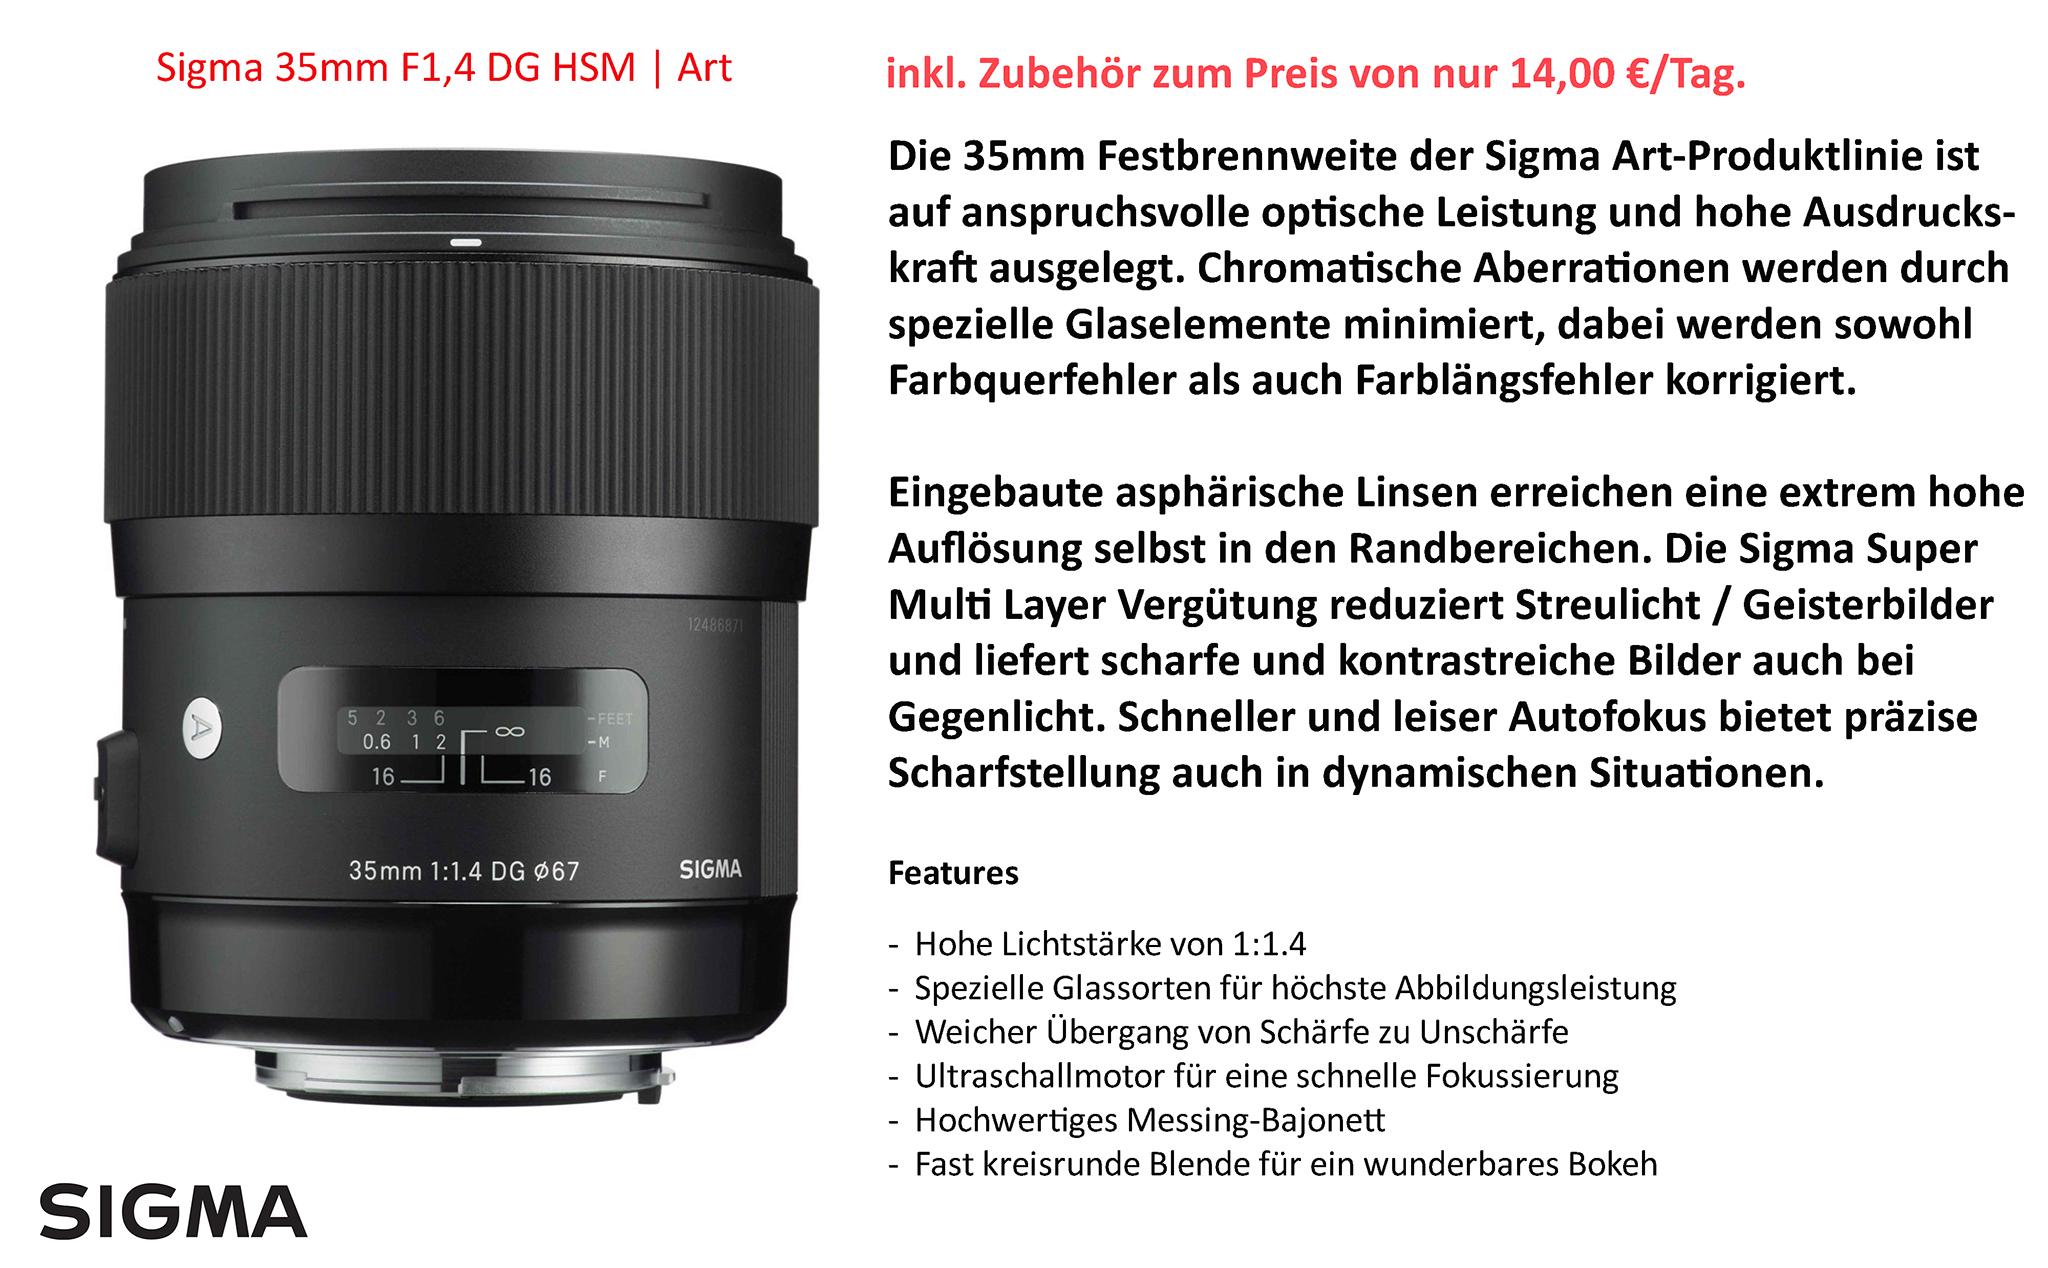 verleih-sigma-35mm Andrea Ludwig Design Fotograf Erfurt